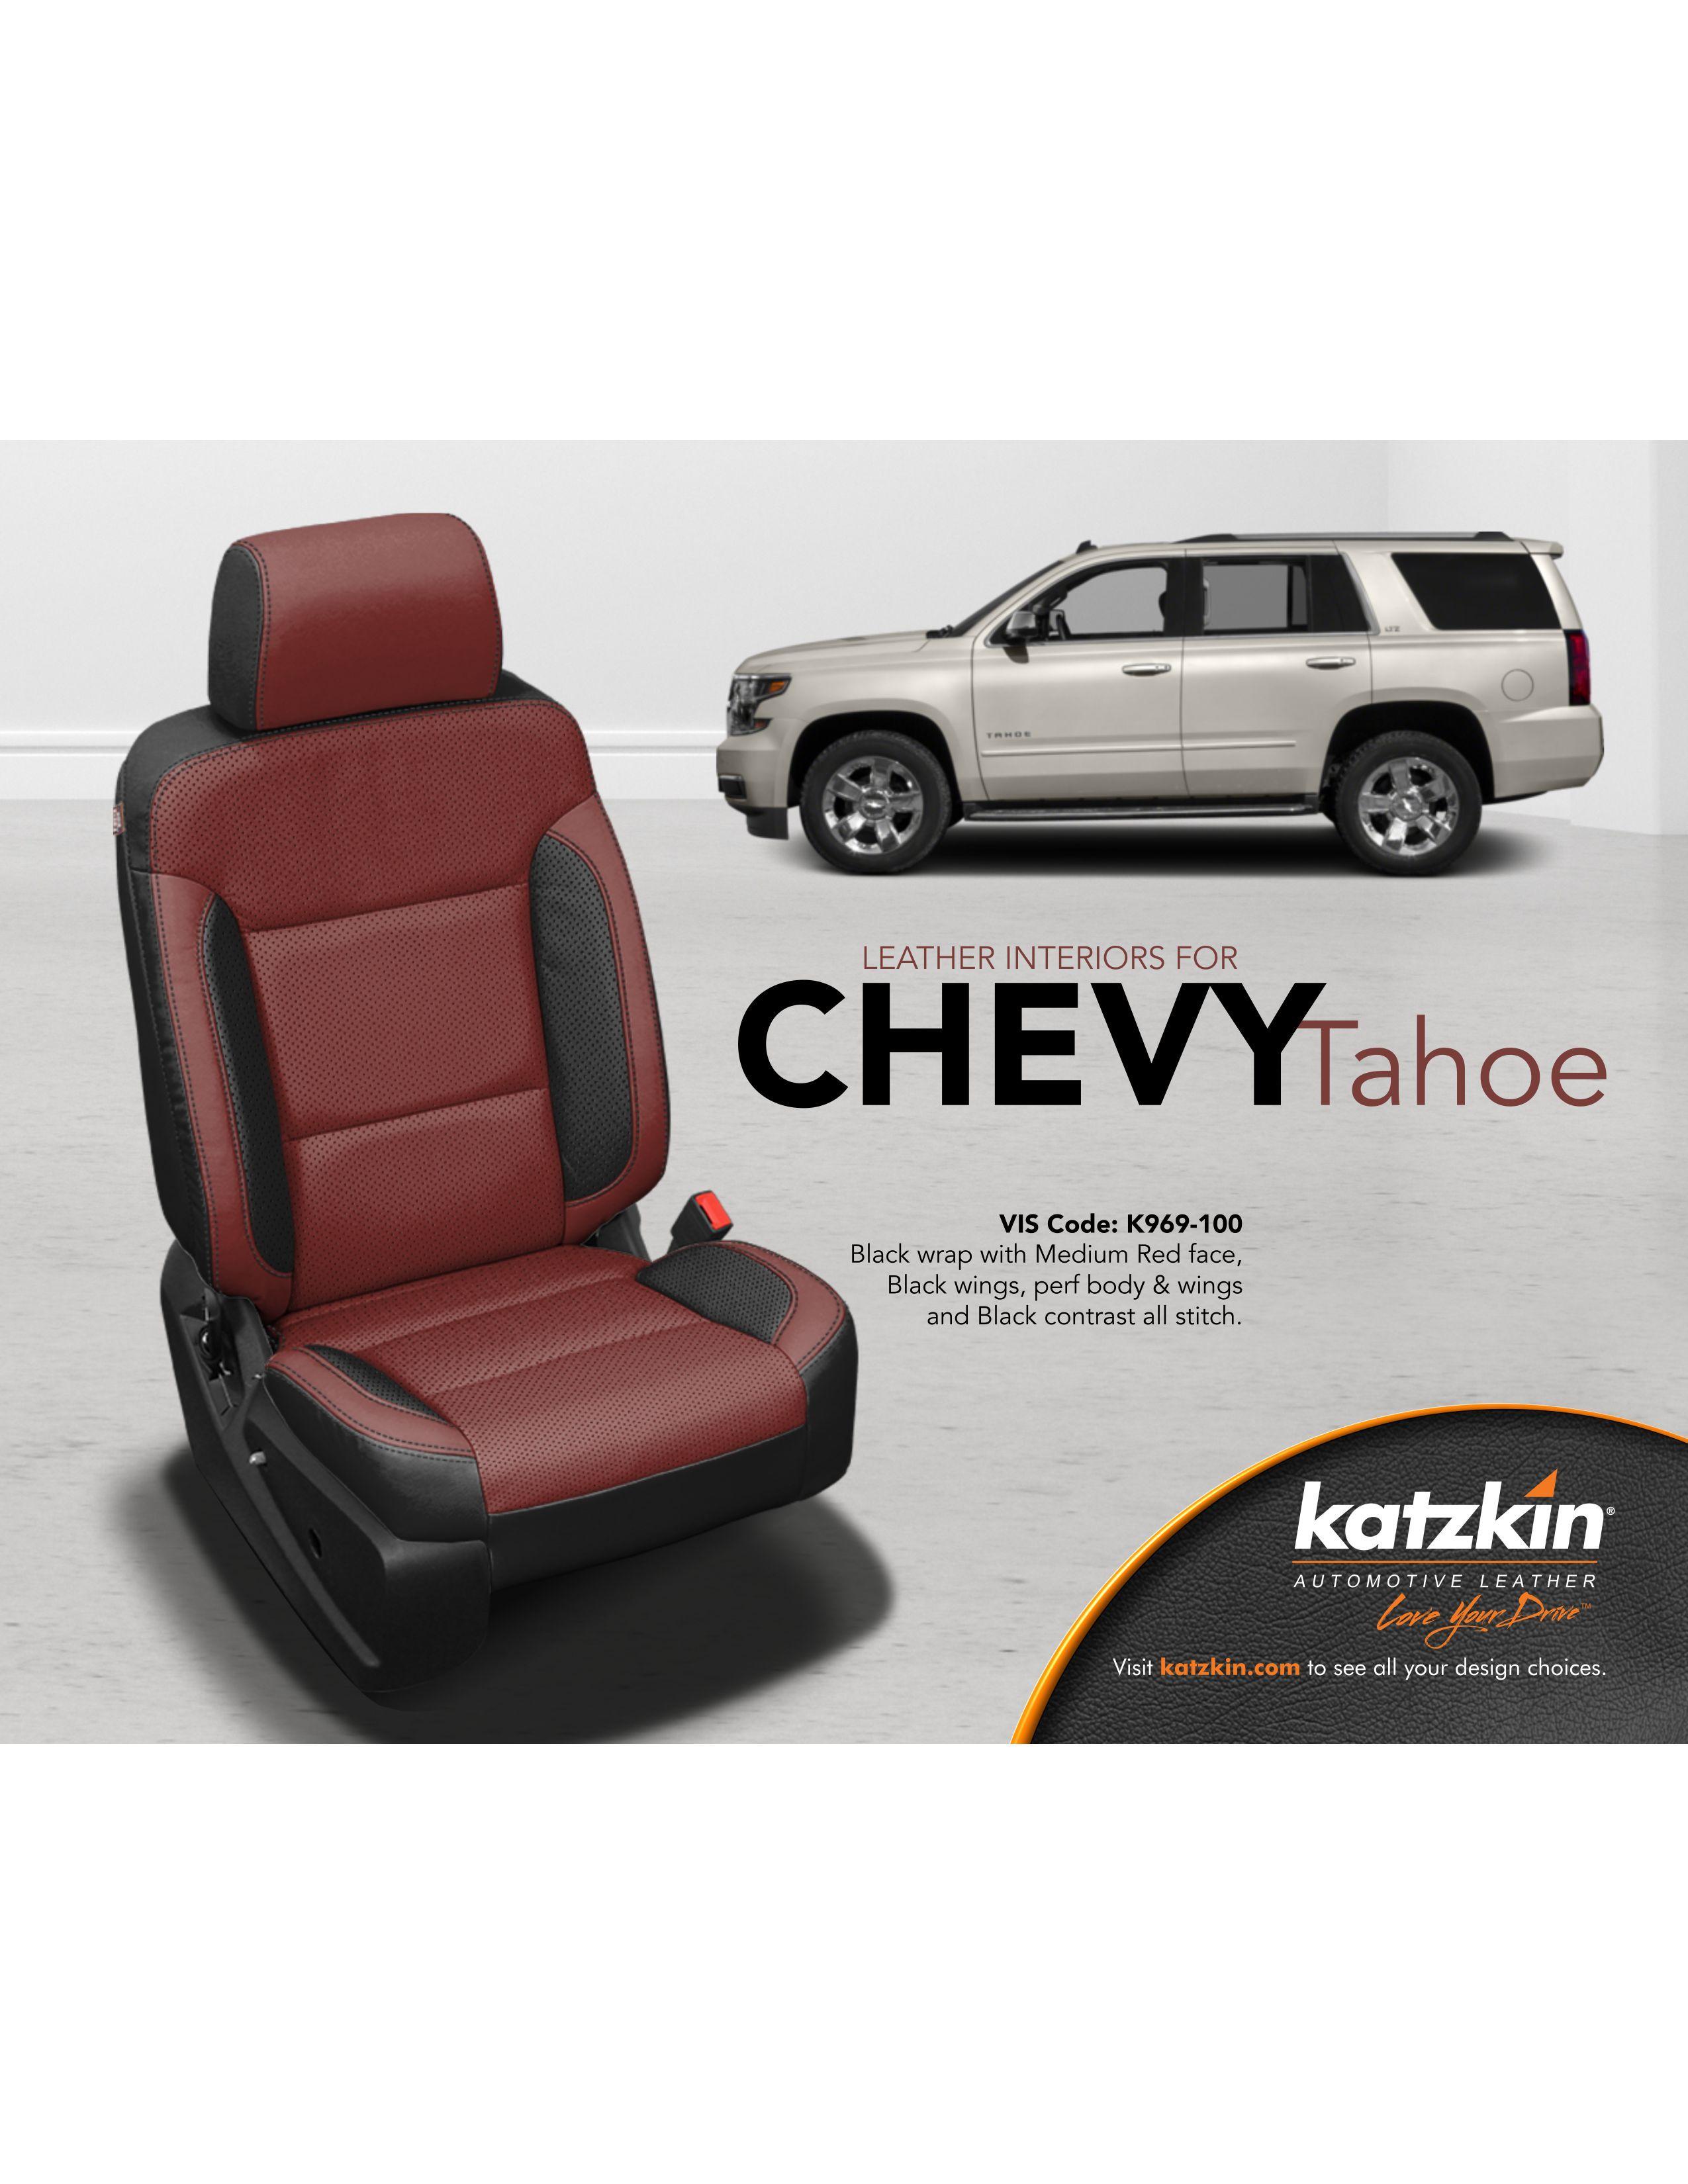 2017 Chevrolet Tahoe (E-Brochure)